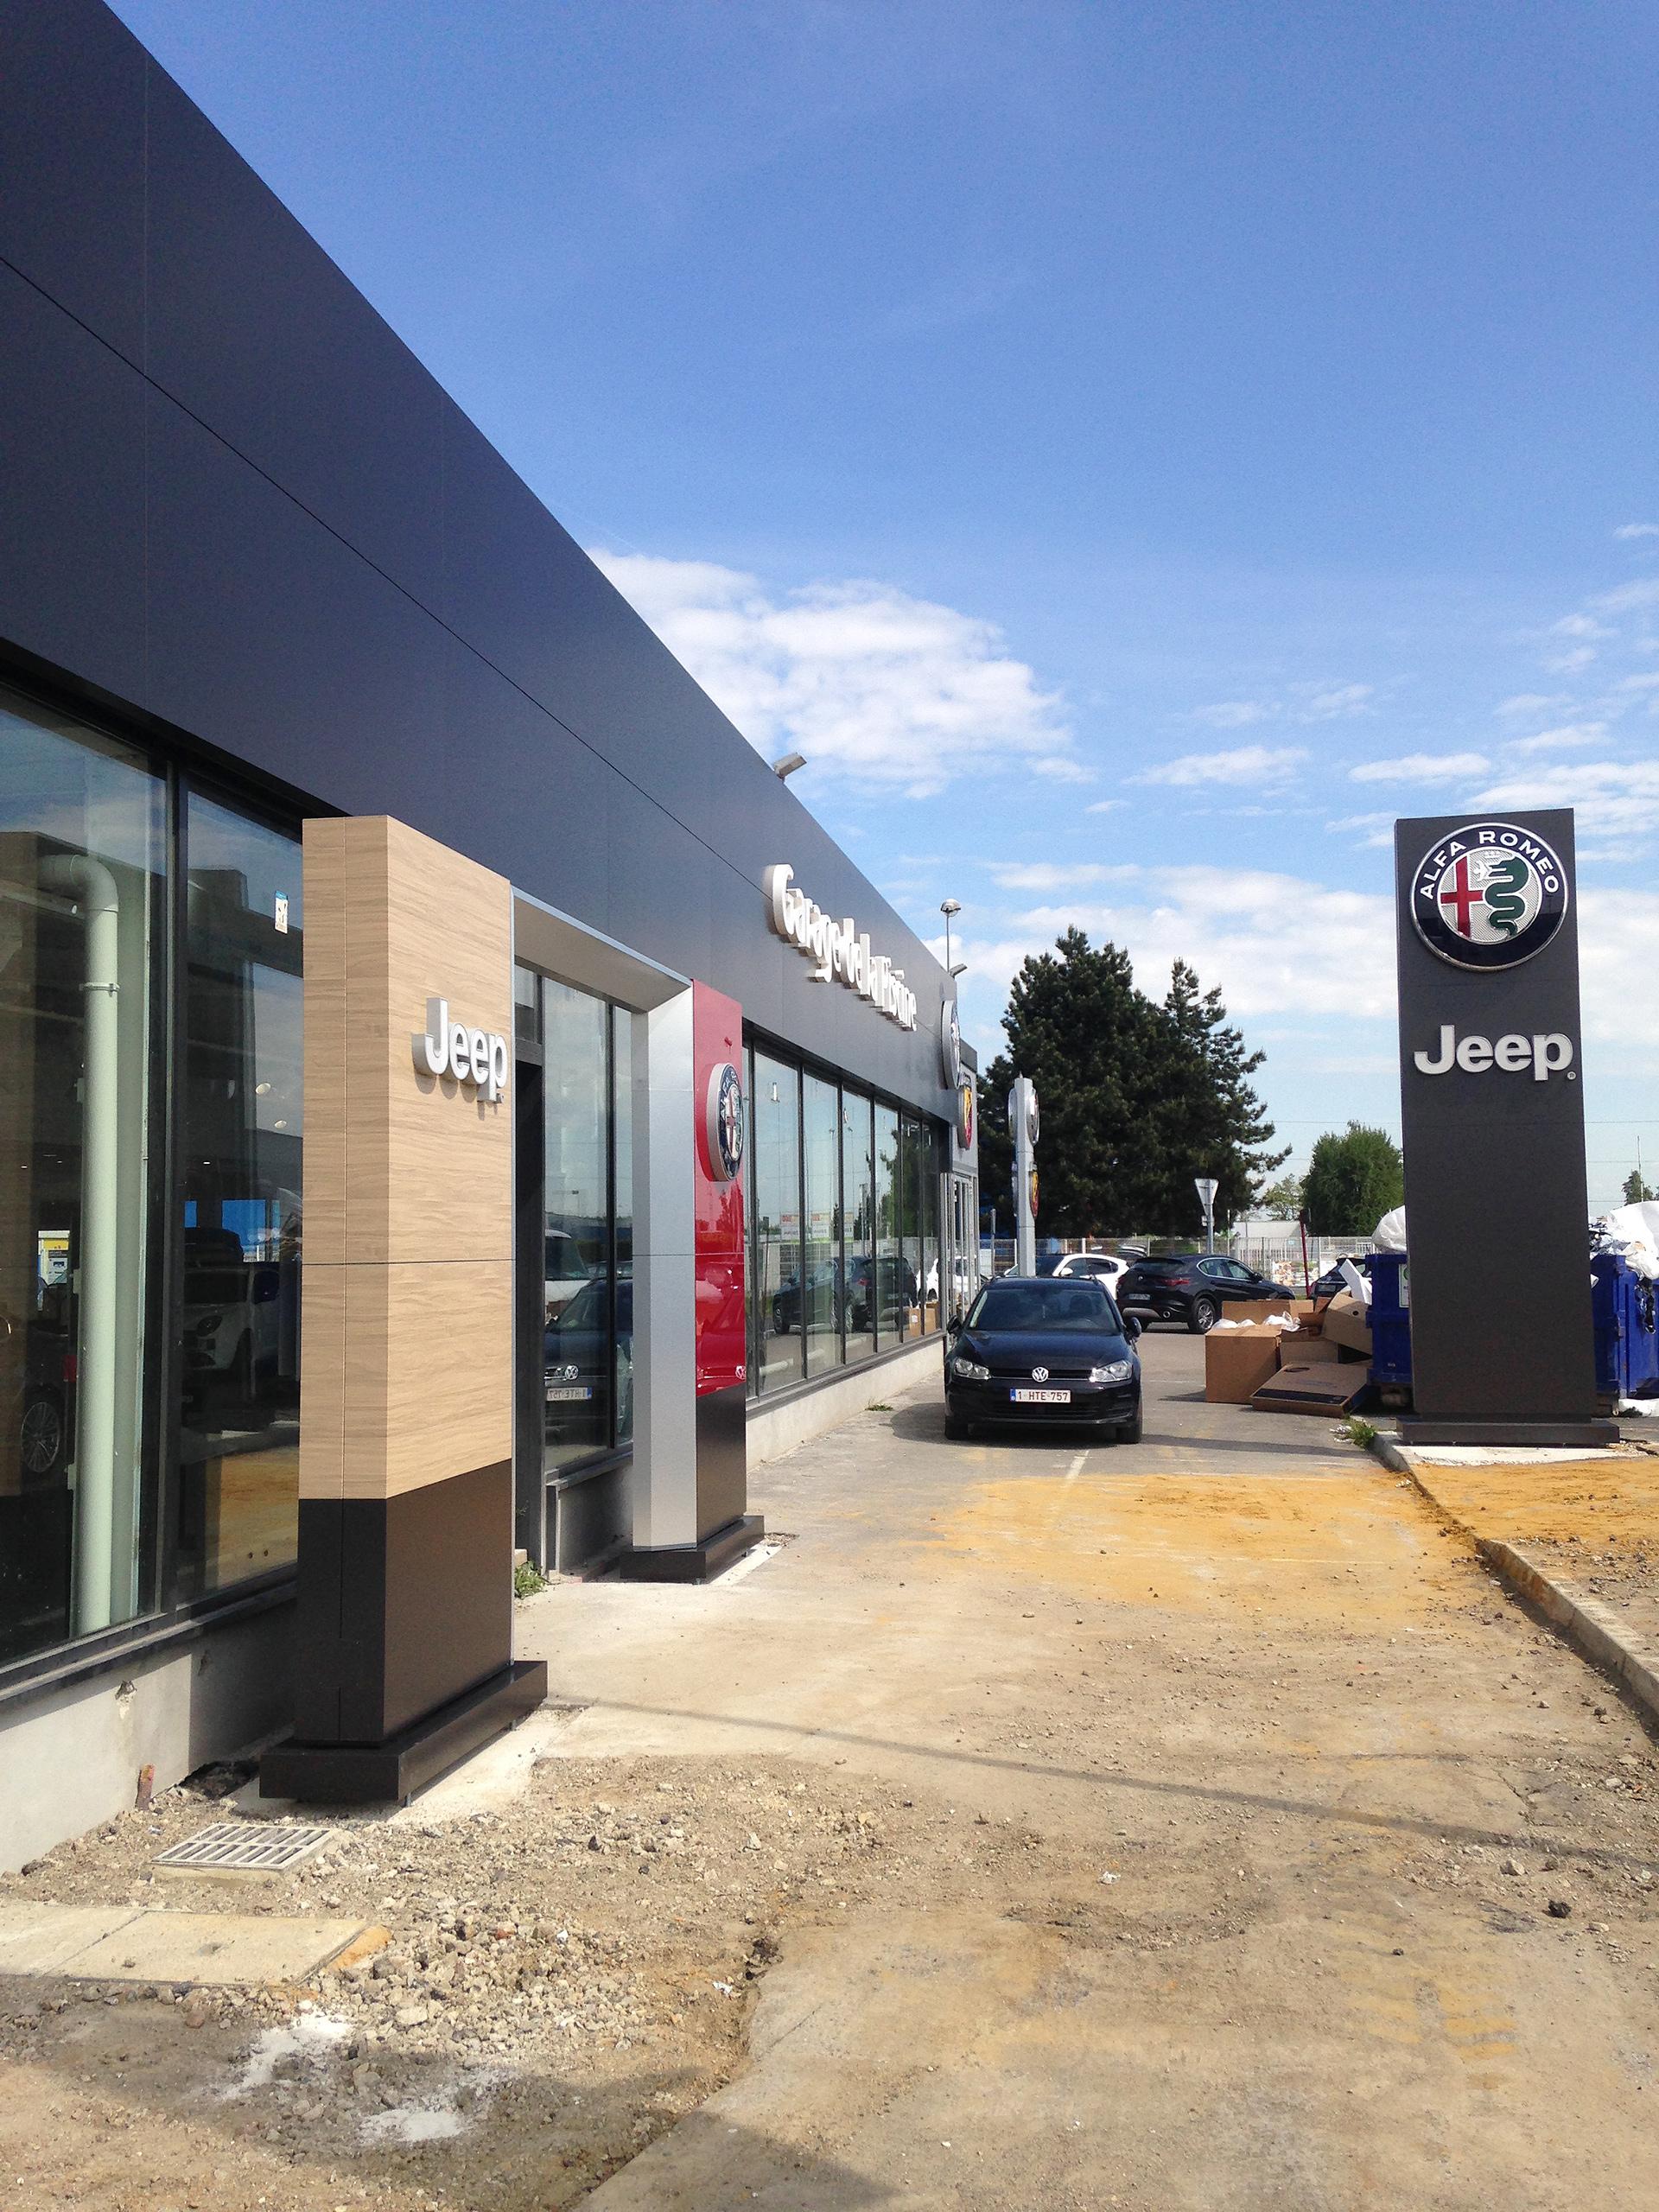 Fiat Alfa Jeep Beauvais